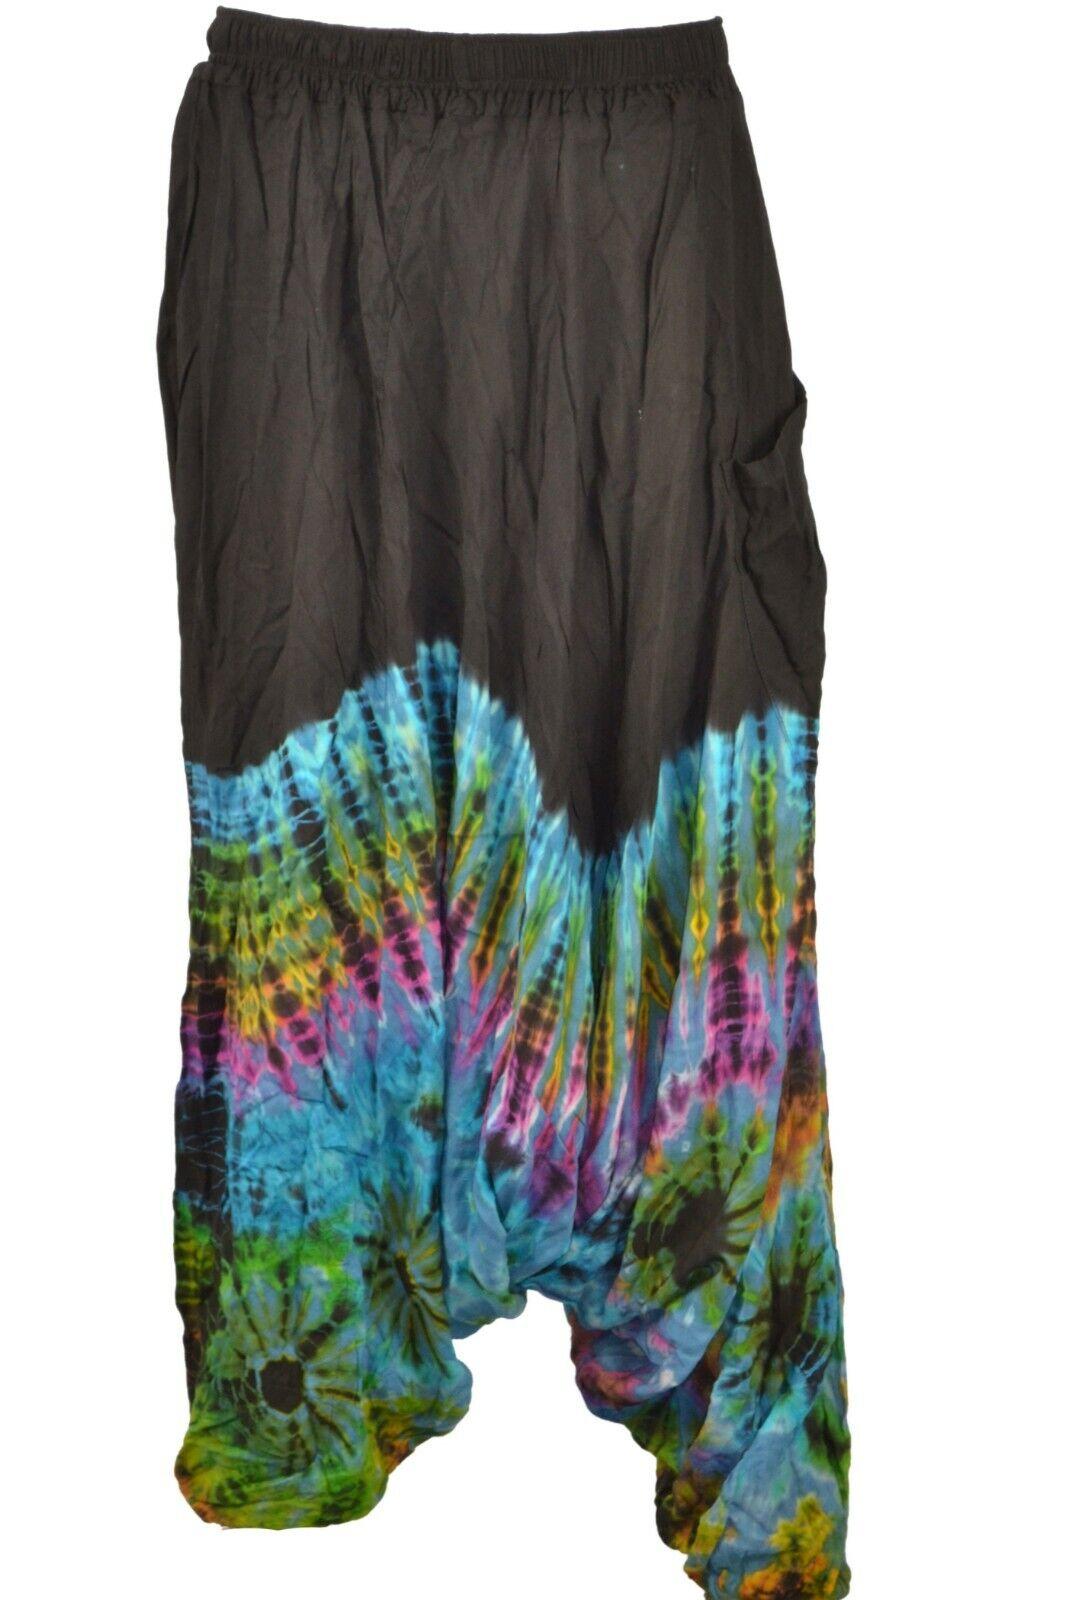 Low Cut Harem Distressed Half Tie Dye Mandala Trousers Hippie Aladdin Trouser